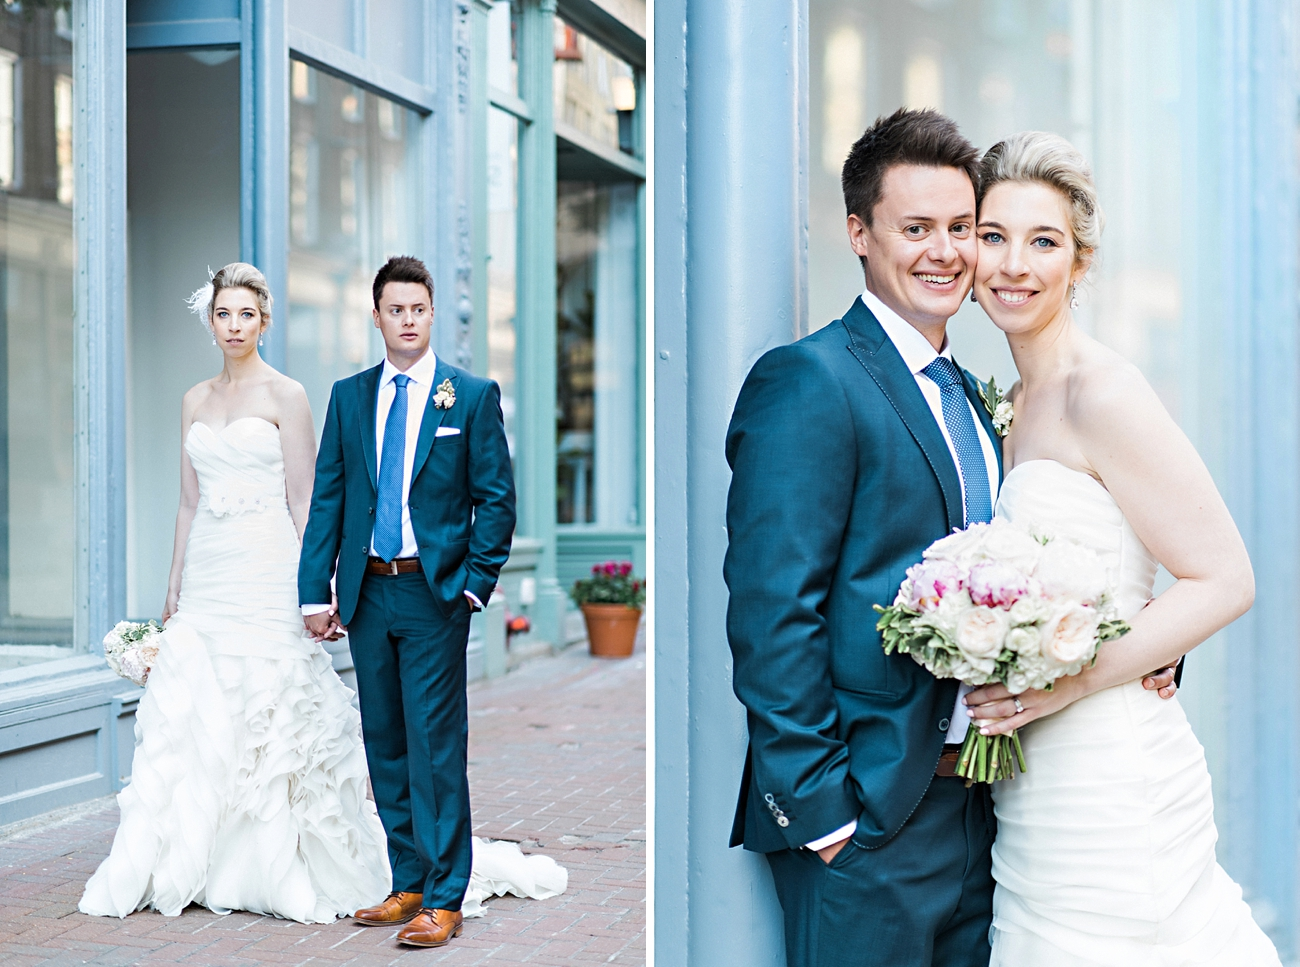 Sara-Seans-Halifax-Prince-George-Hotel-Wedding051.jpg